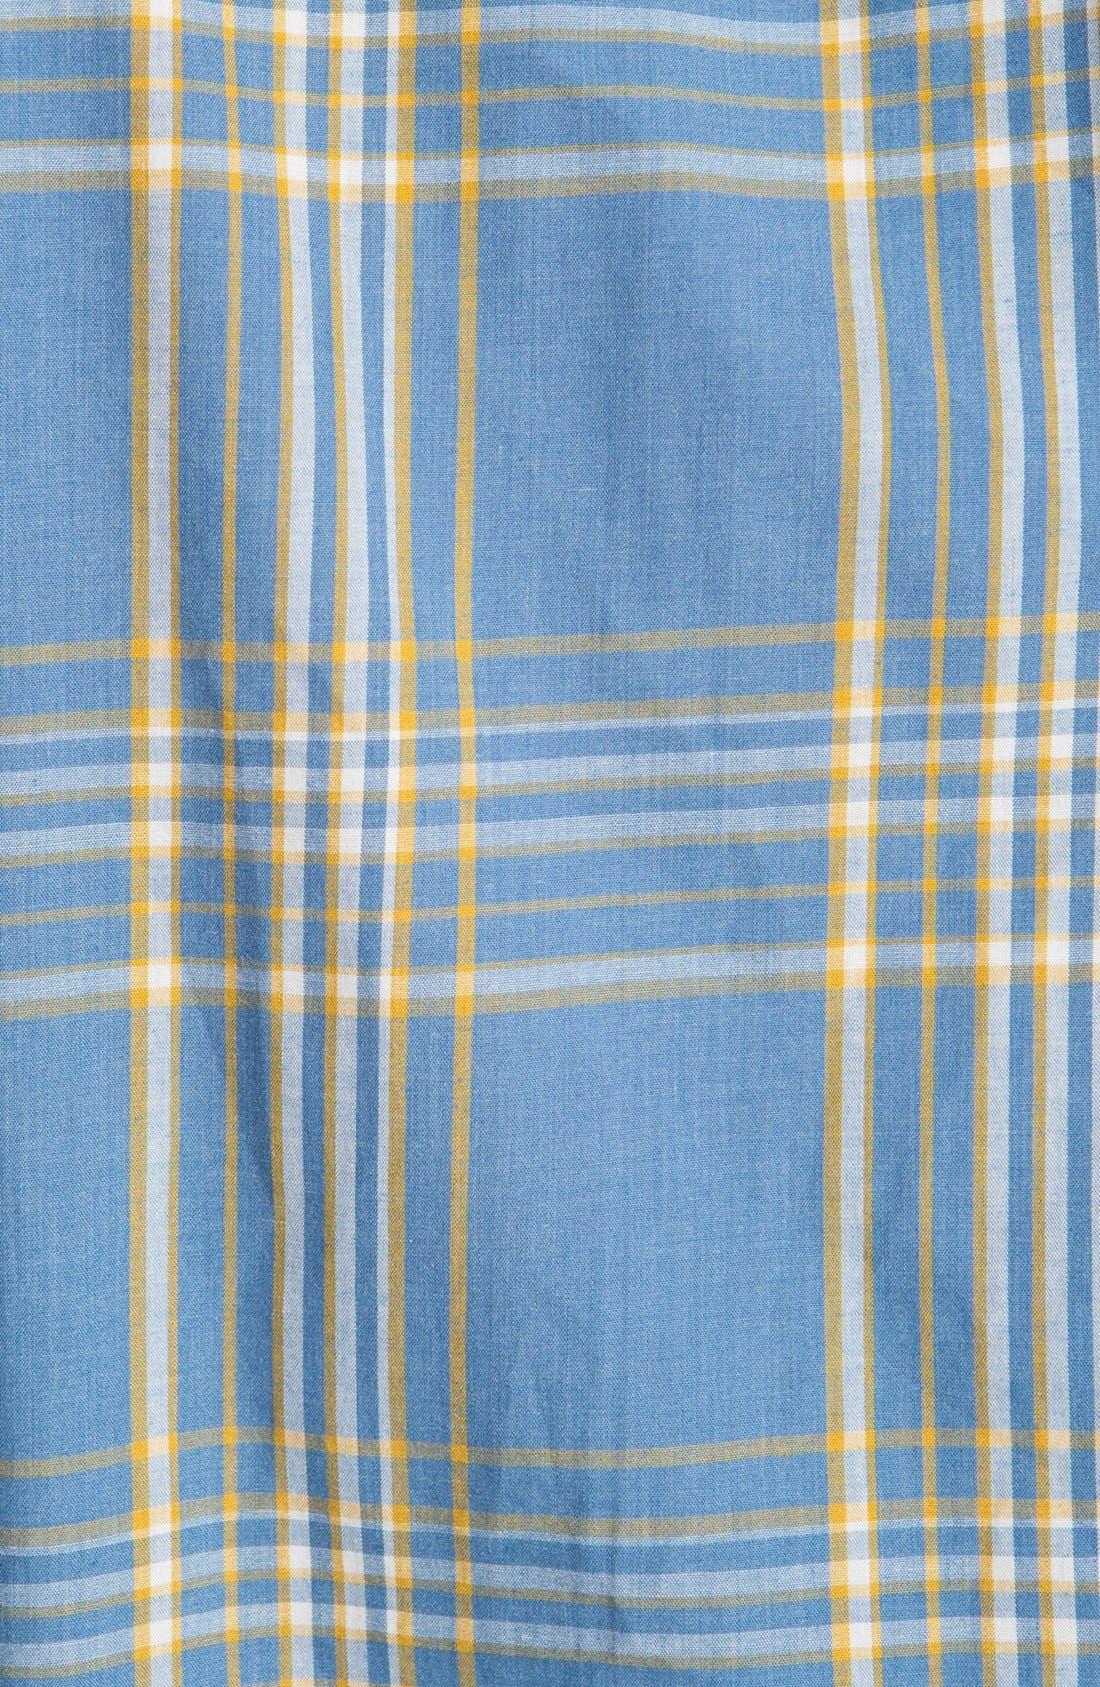 Alternate Image 3  - Volcom 'Why Factor' Plaid Woven Shirt